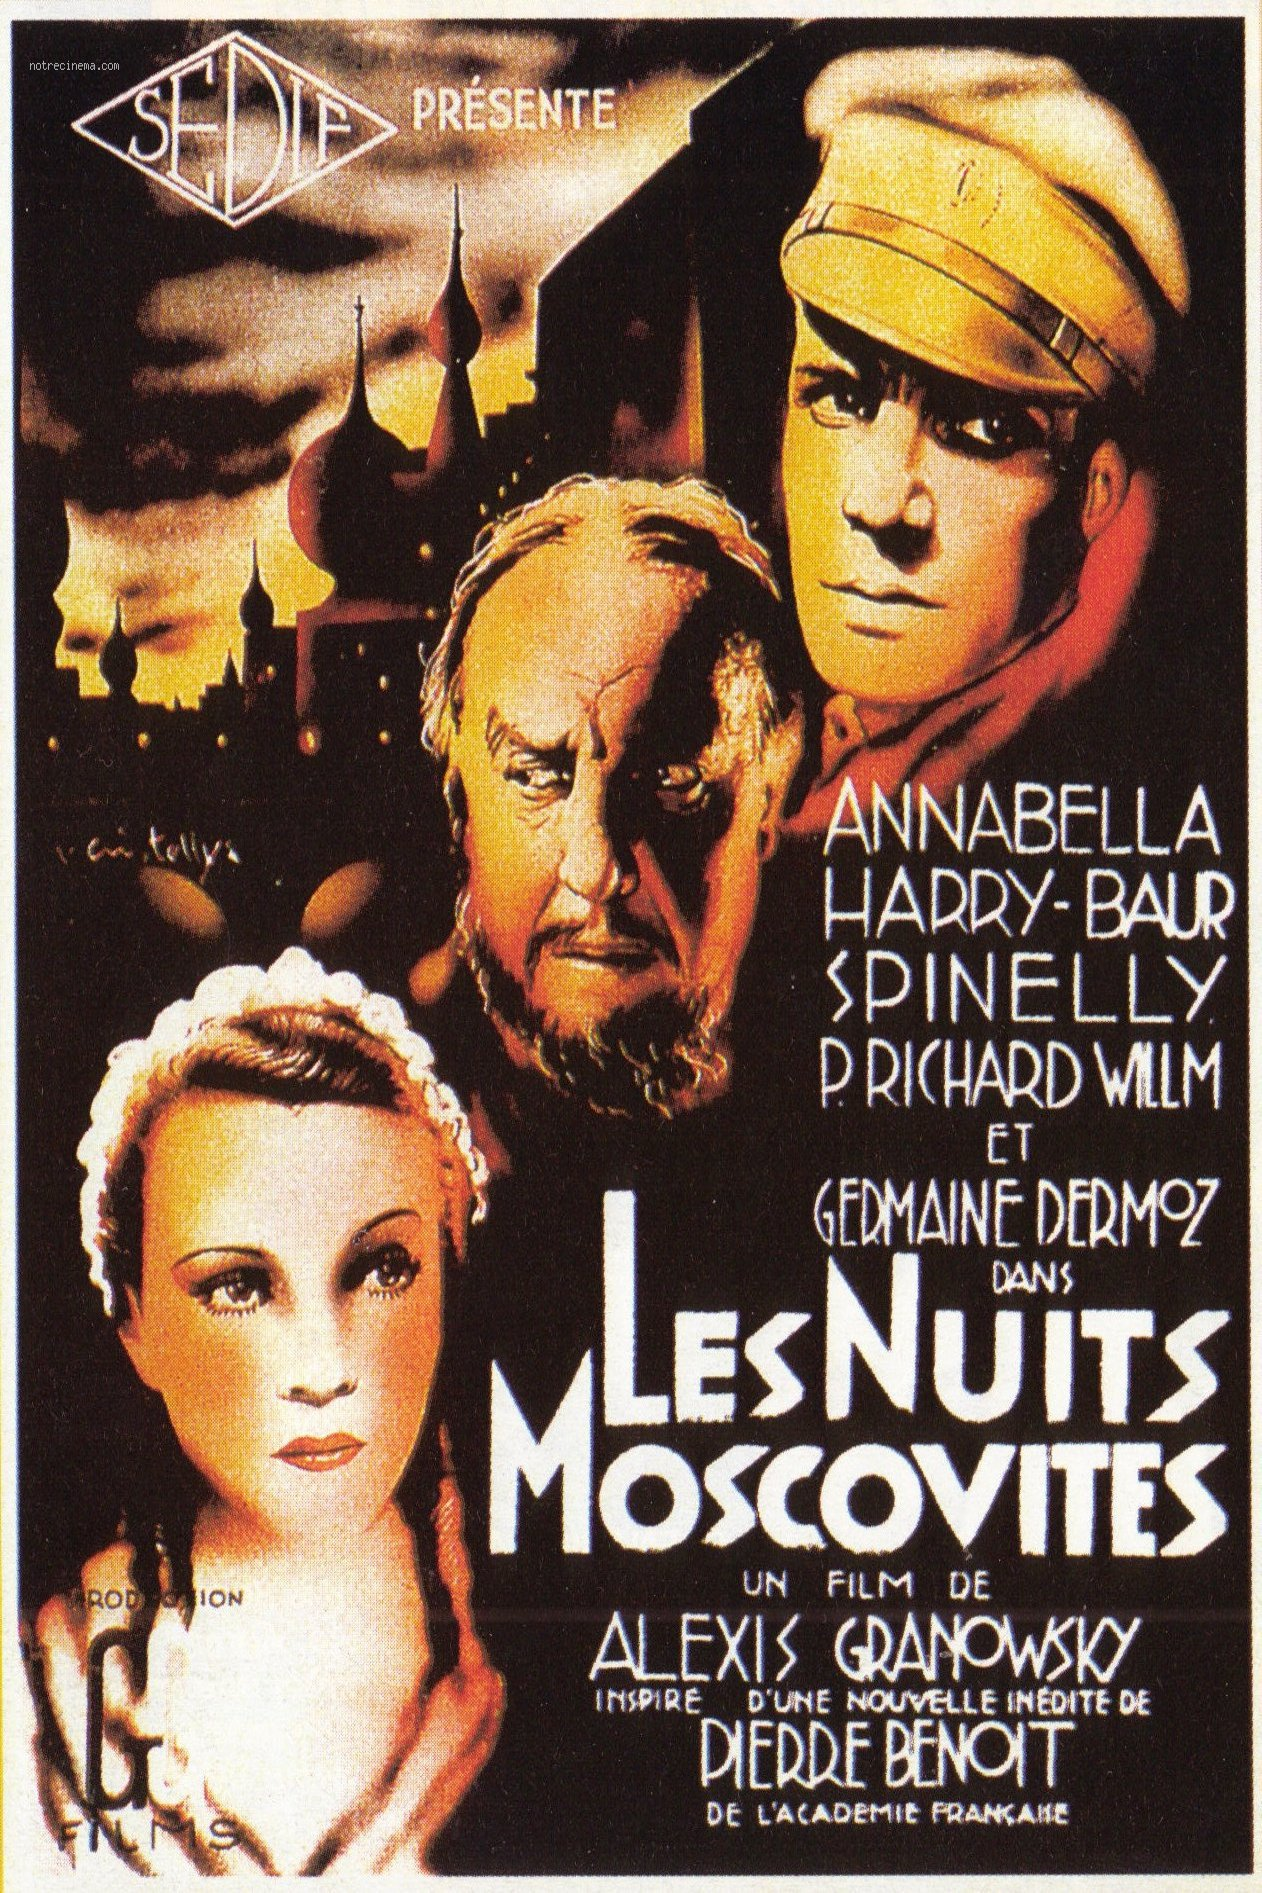 Benoit Meimiel - prodigy of French cinema 71